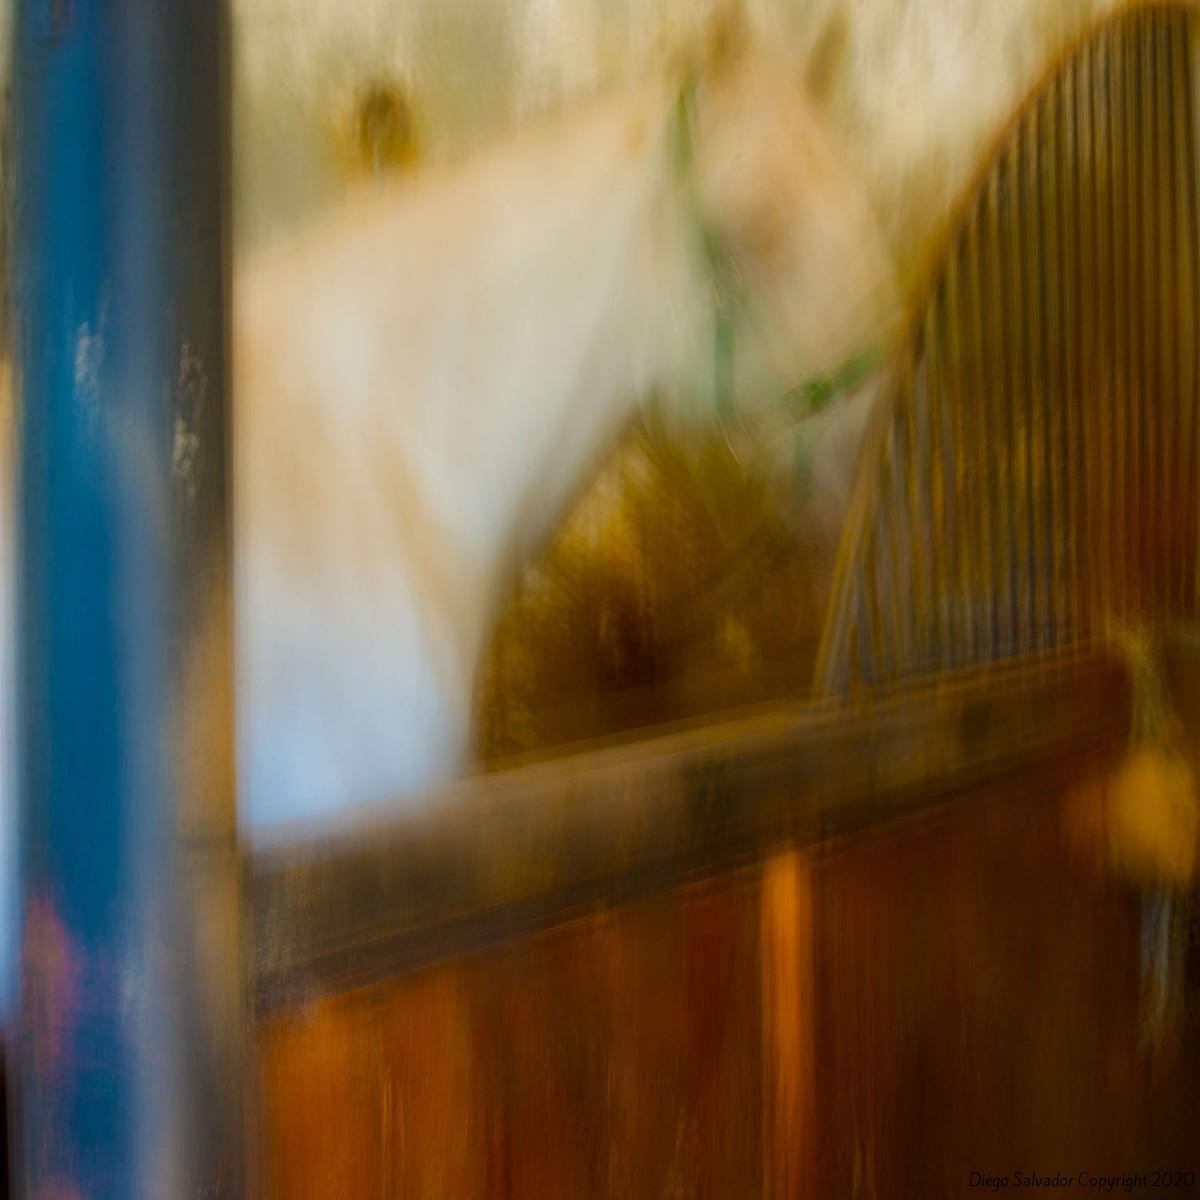 2014 - Eleganthorse9 - Diego Salvador